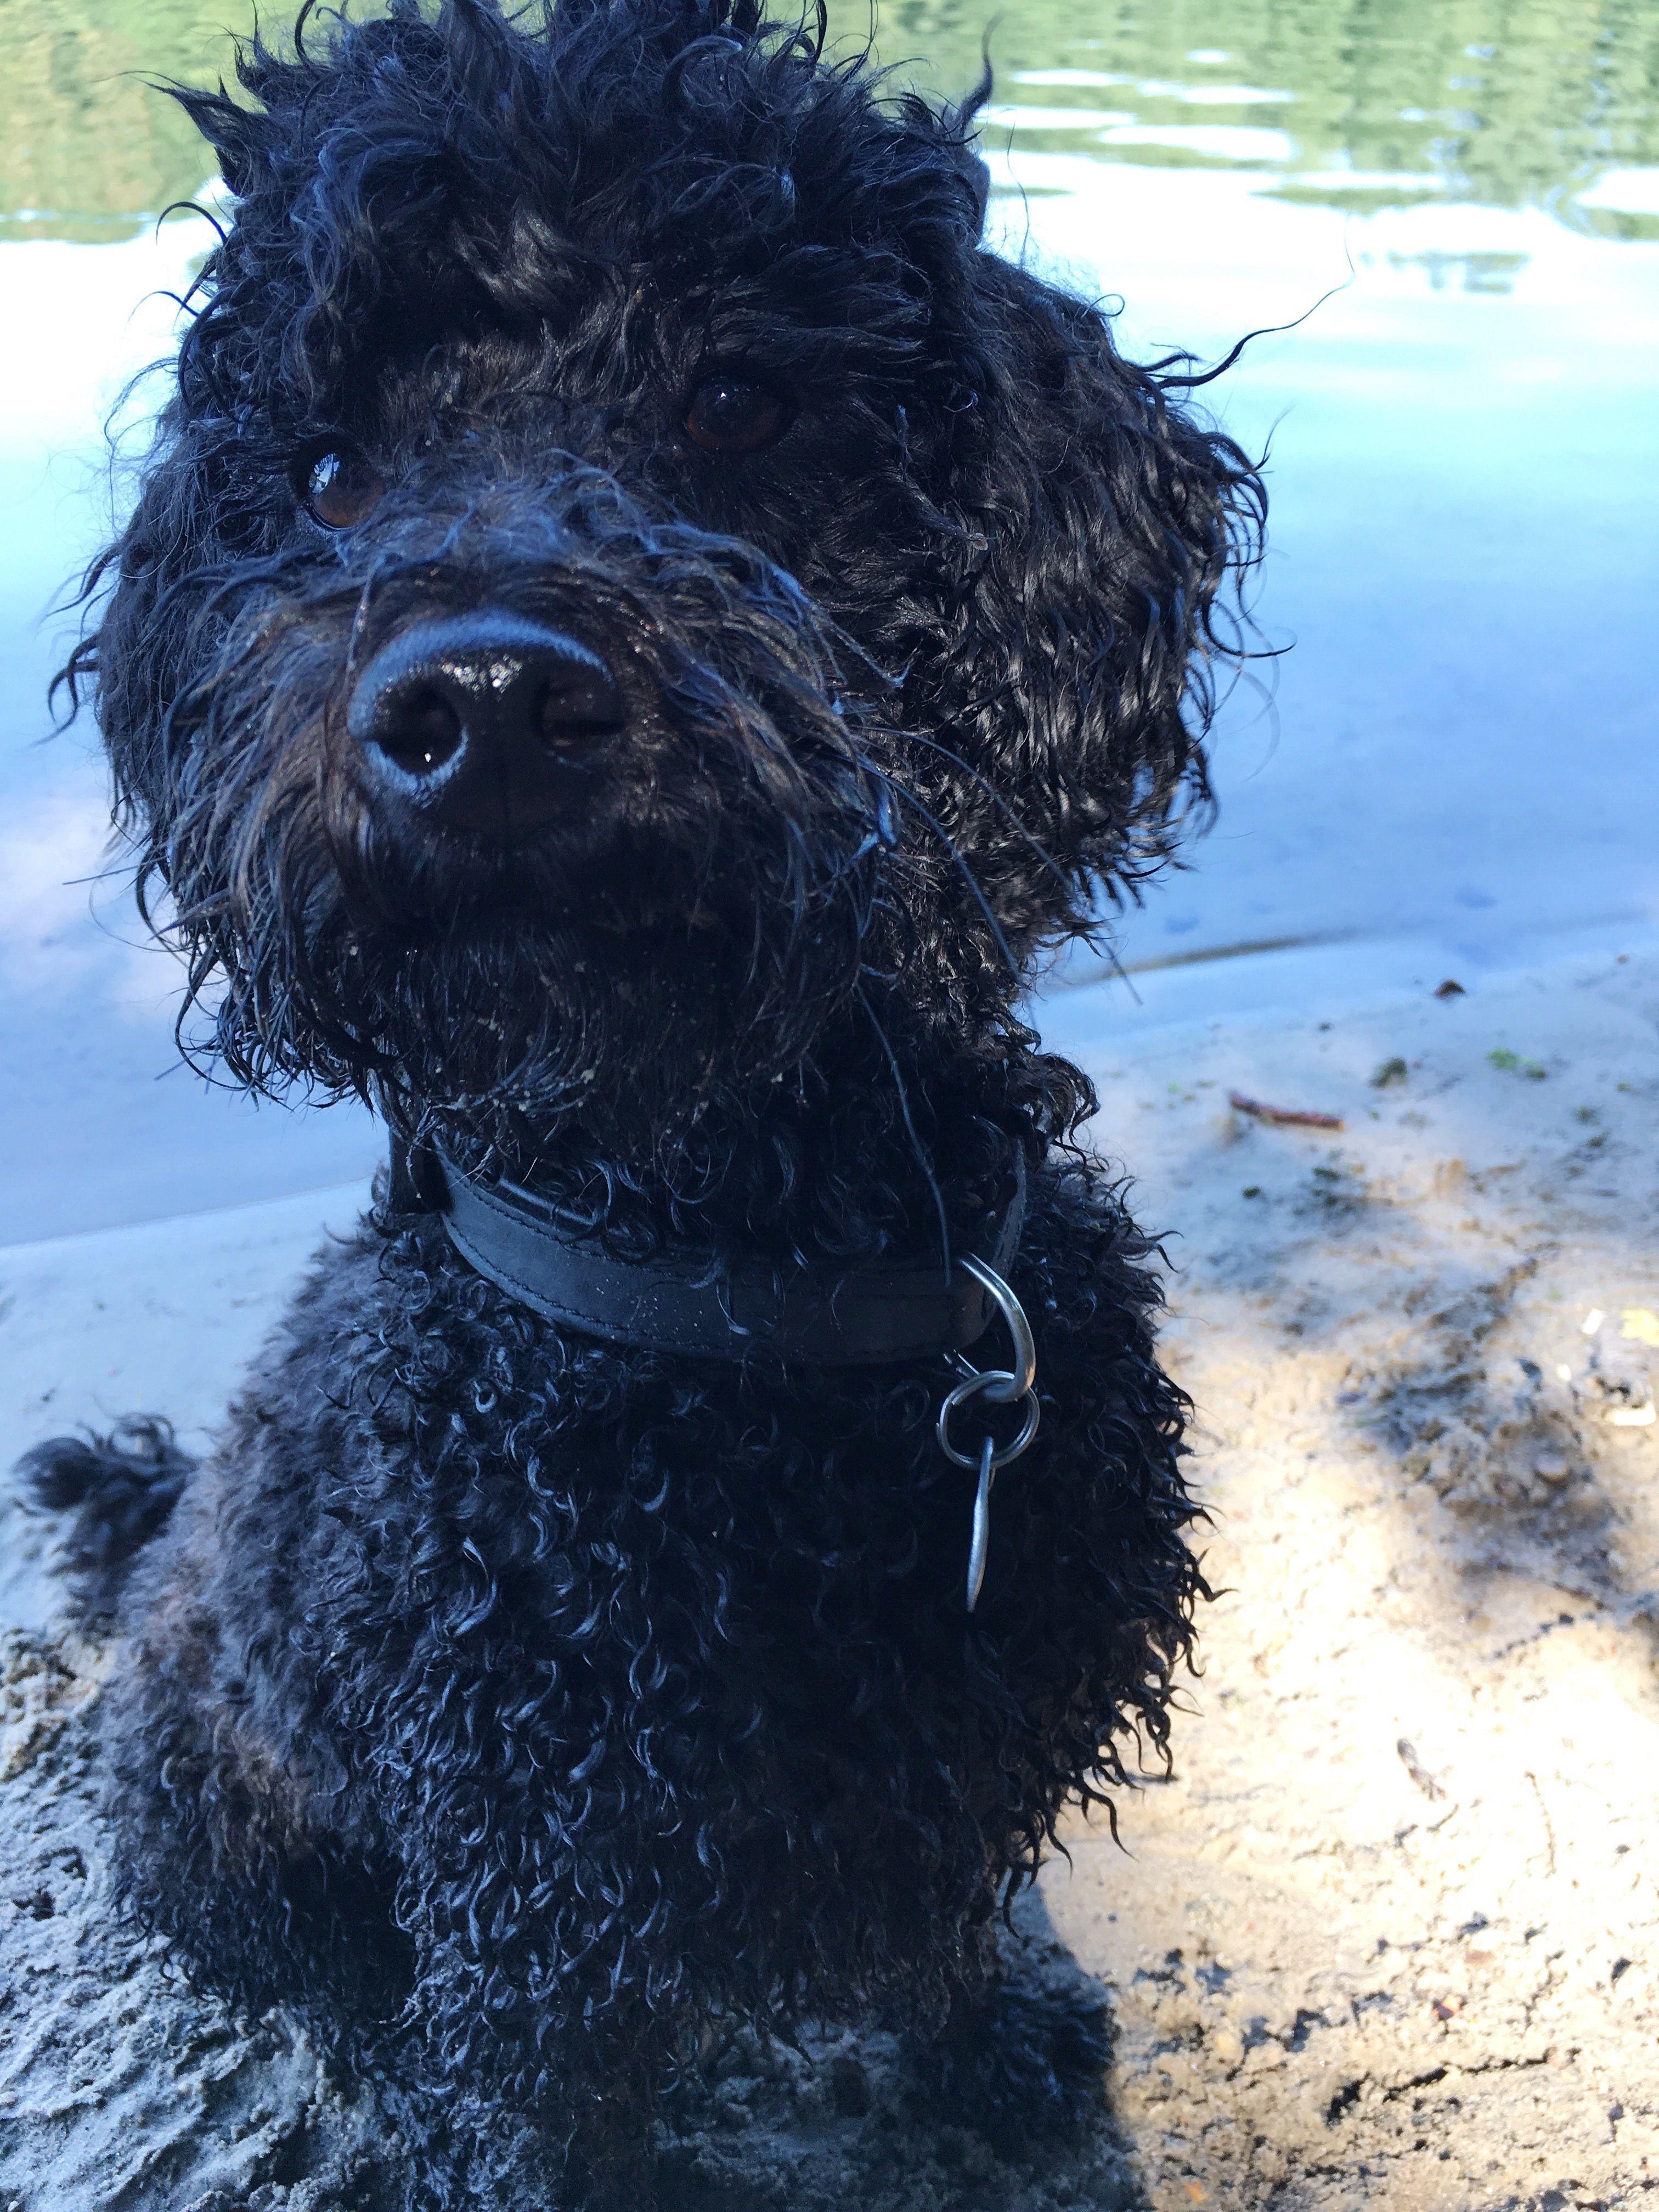 Pack Die Badehose Ein Oder Lieber Doch Nicht Pudelwohl Berlin Pudel Gesunde Hunde Hunde